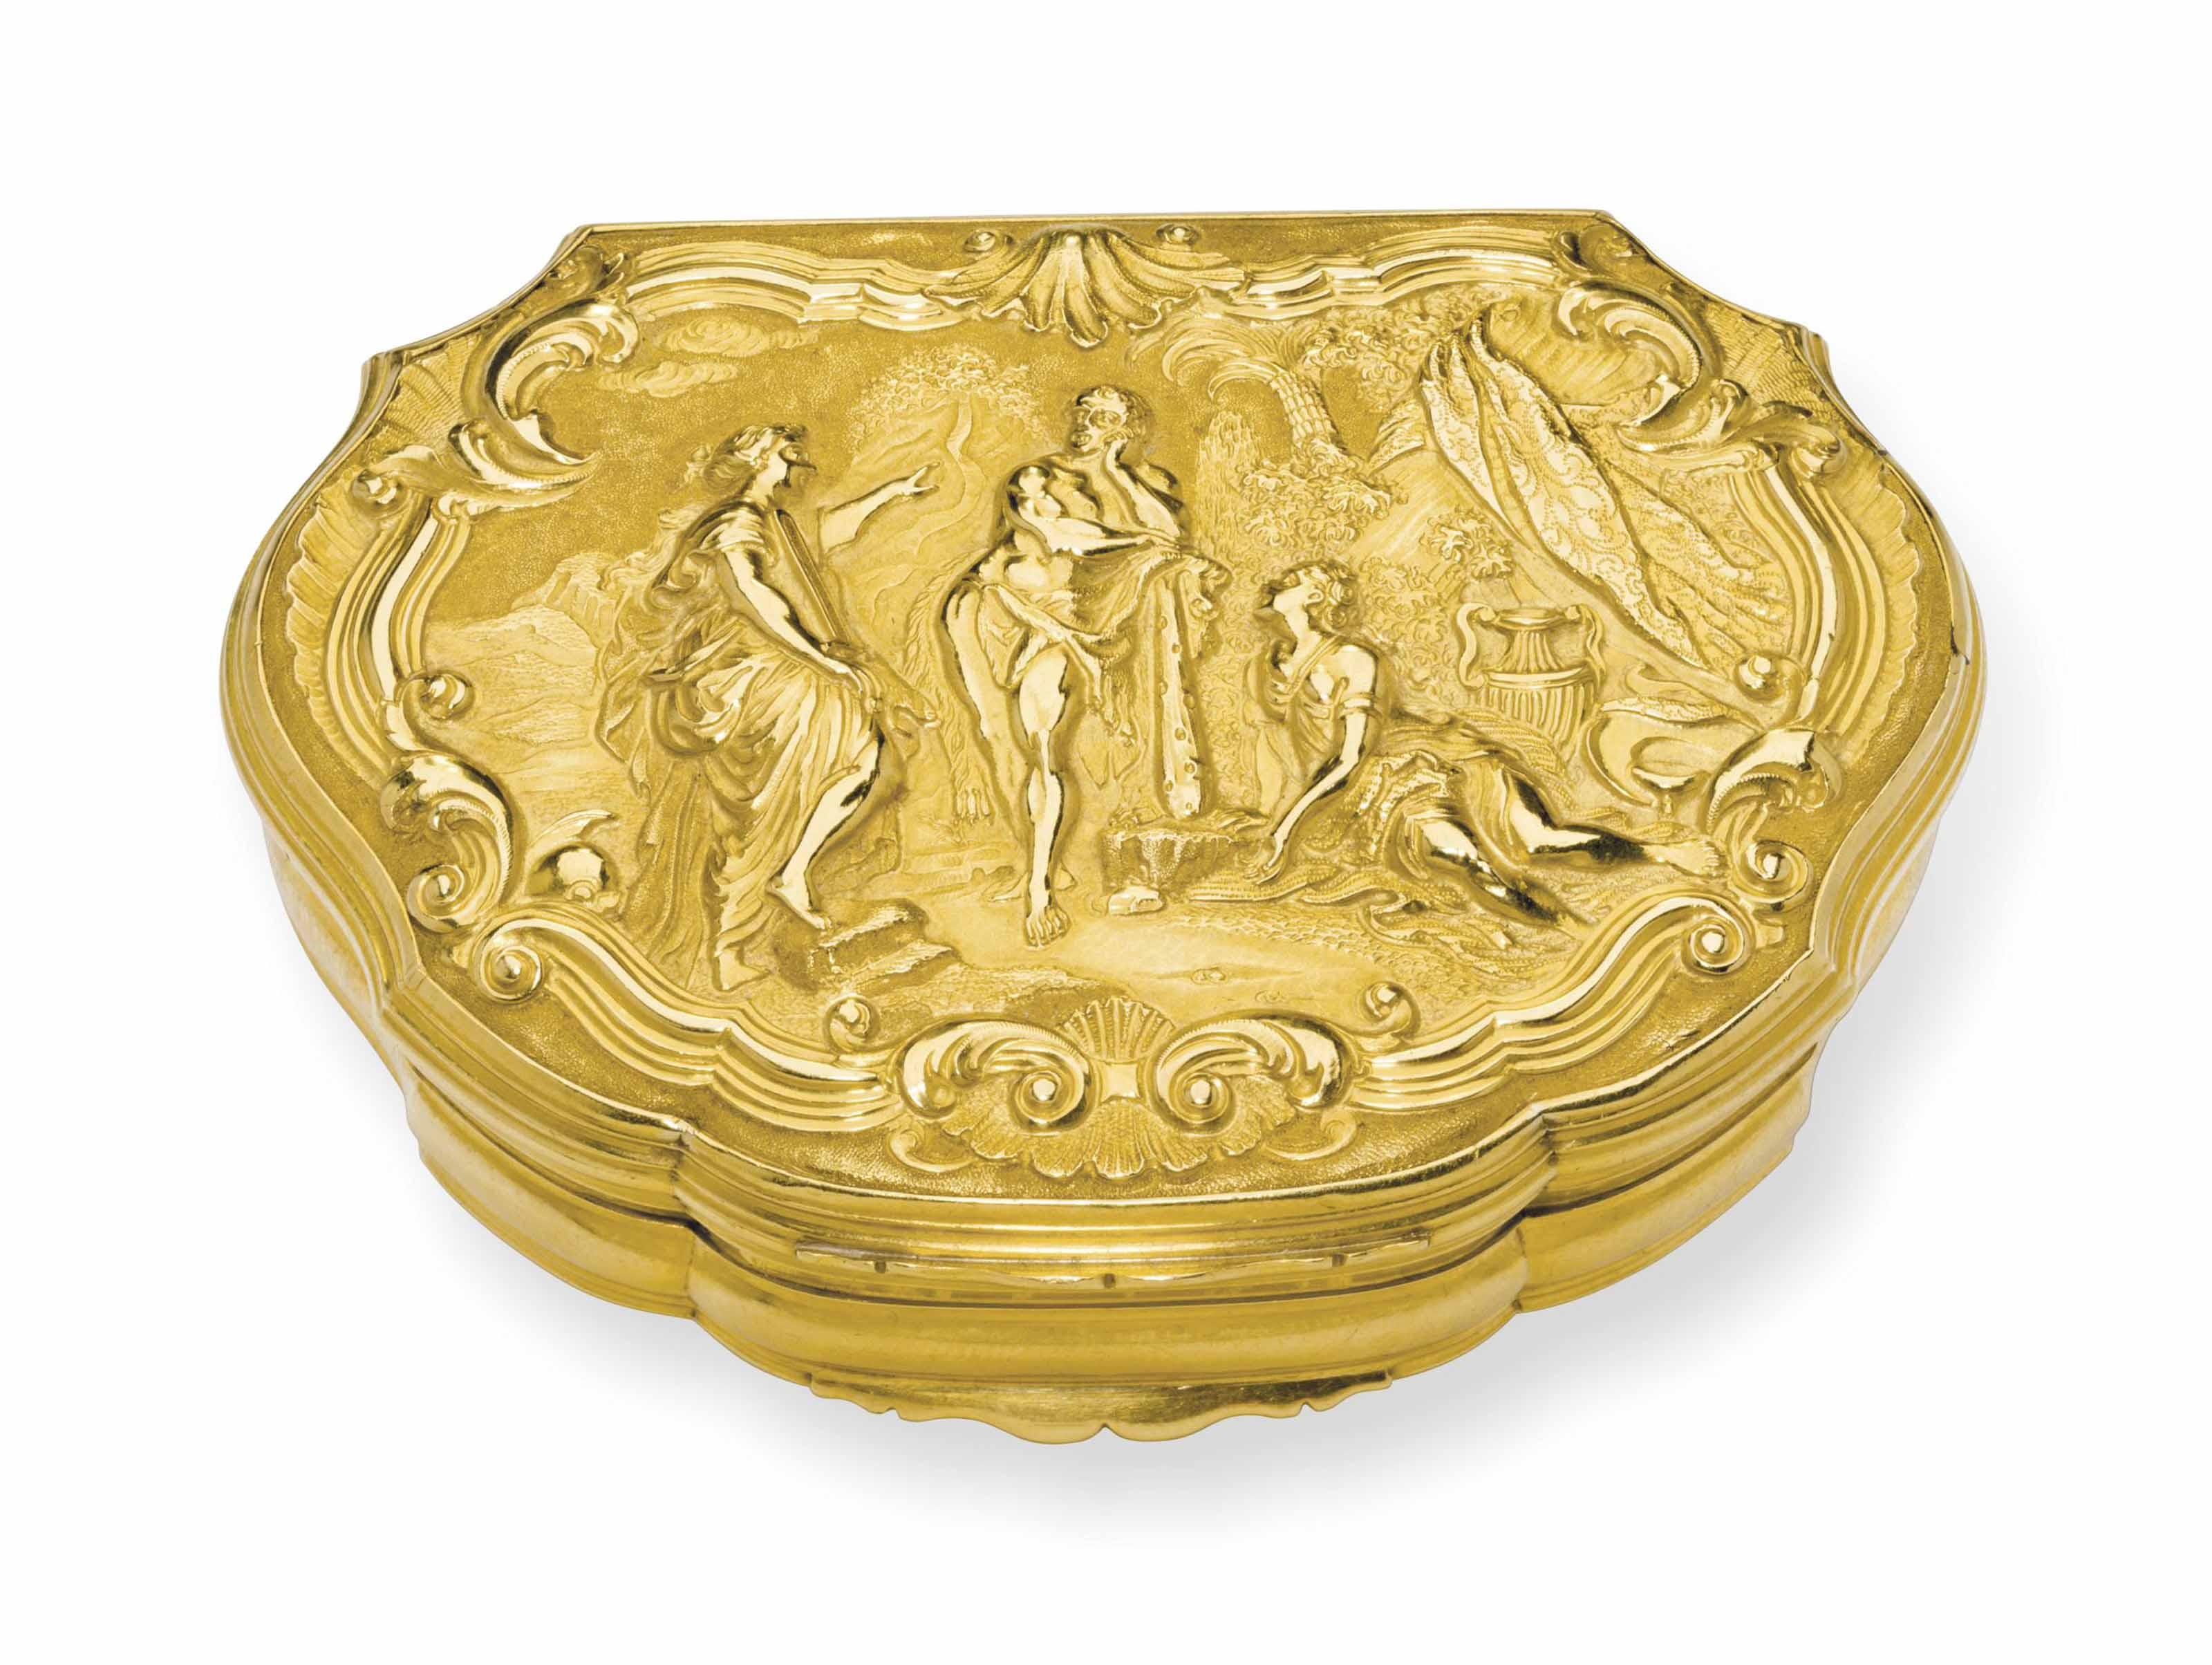 A GEORGE II GOLD SNUFF BOX